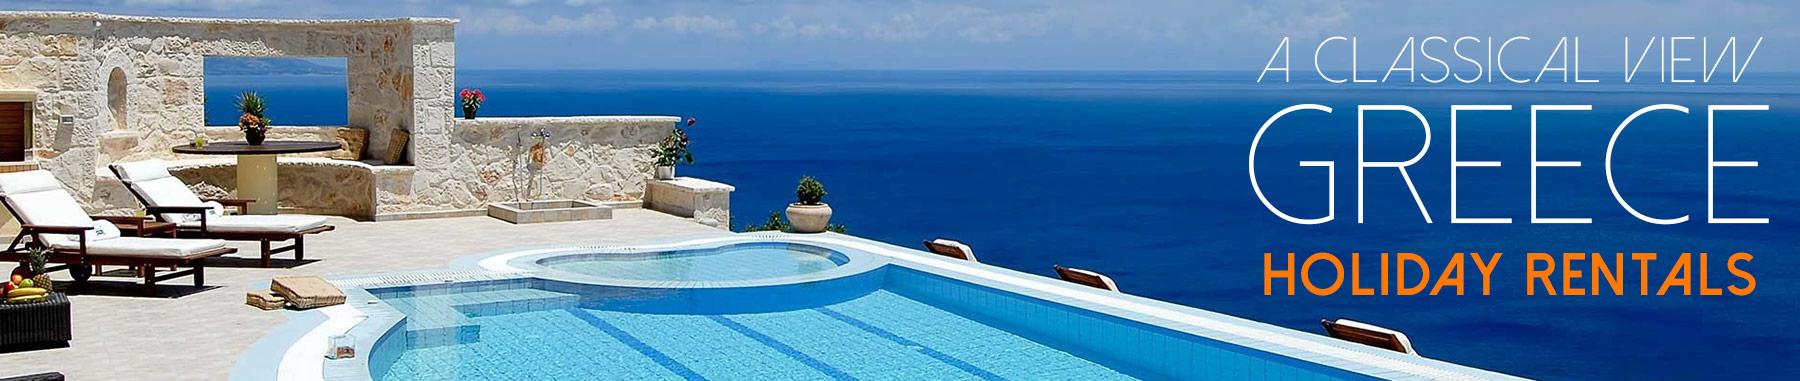 Greek Villas and Apartments